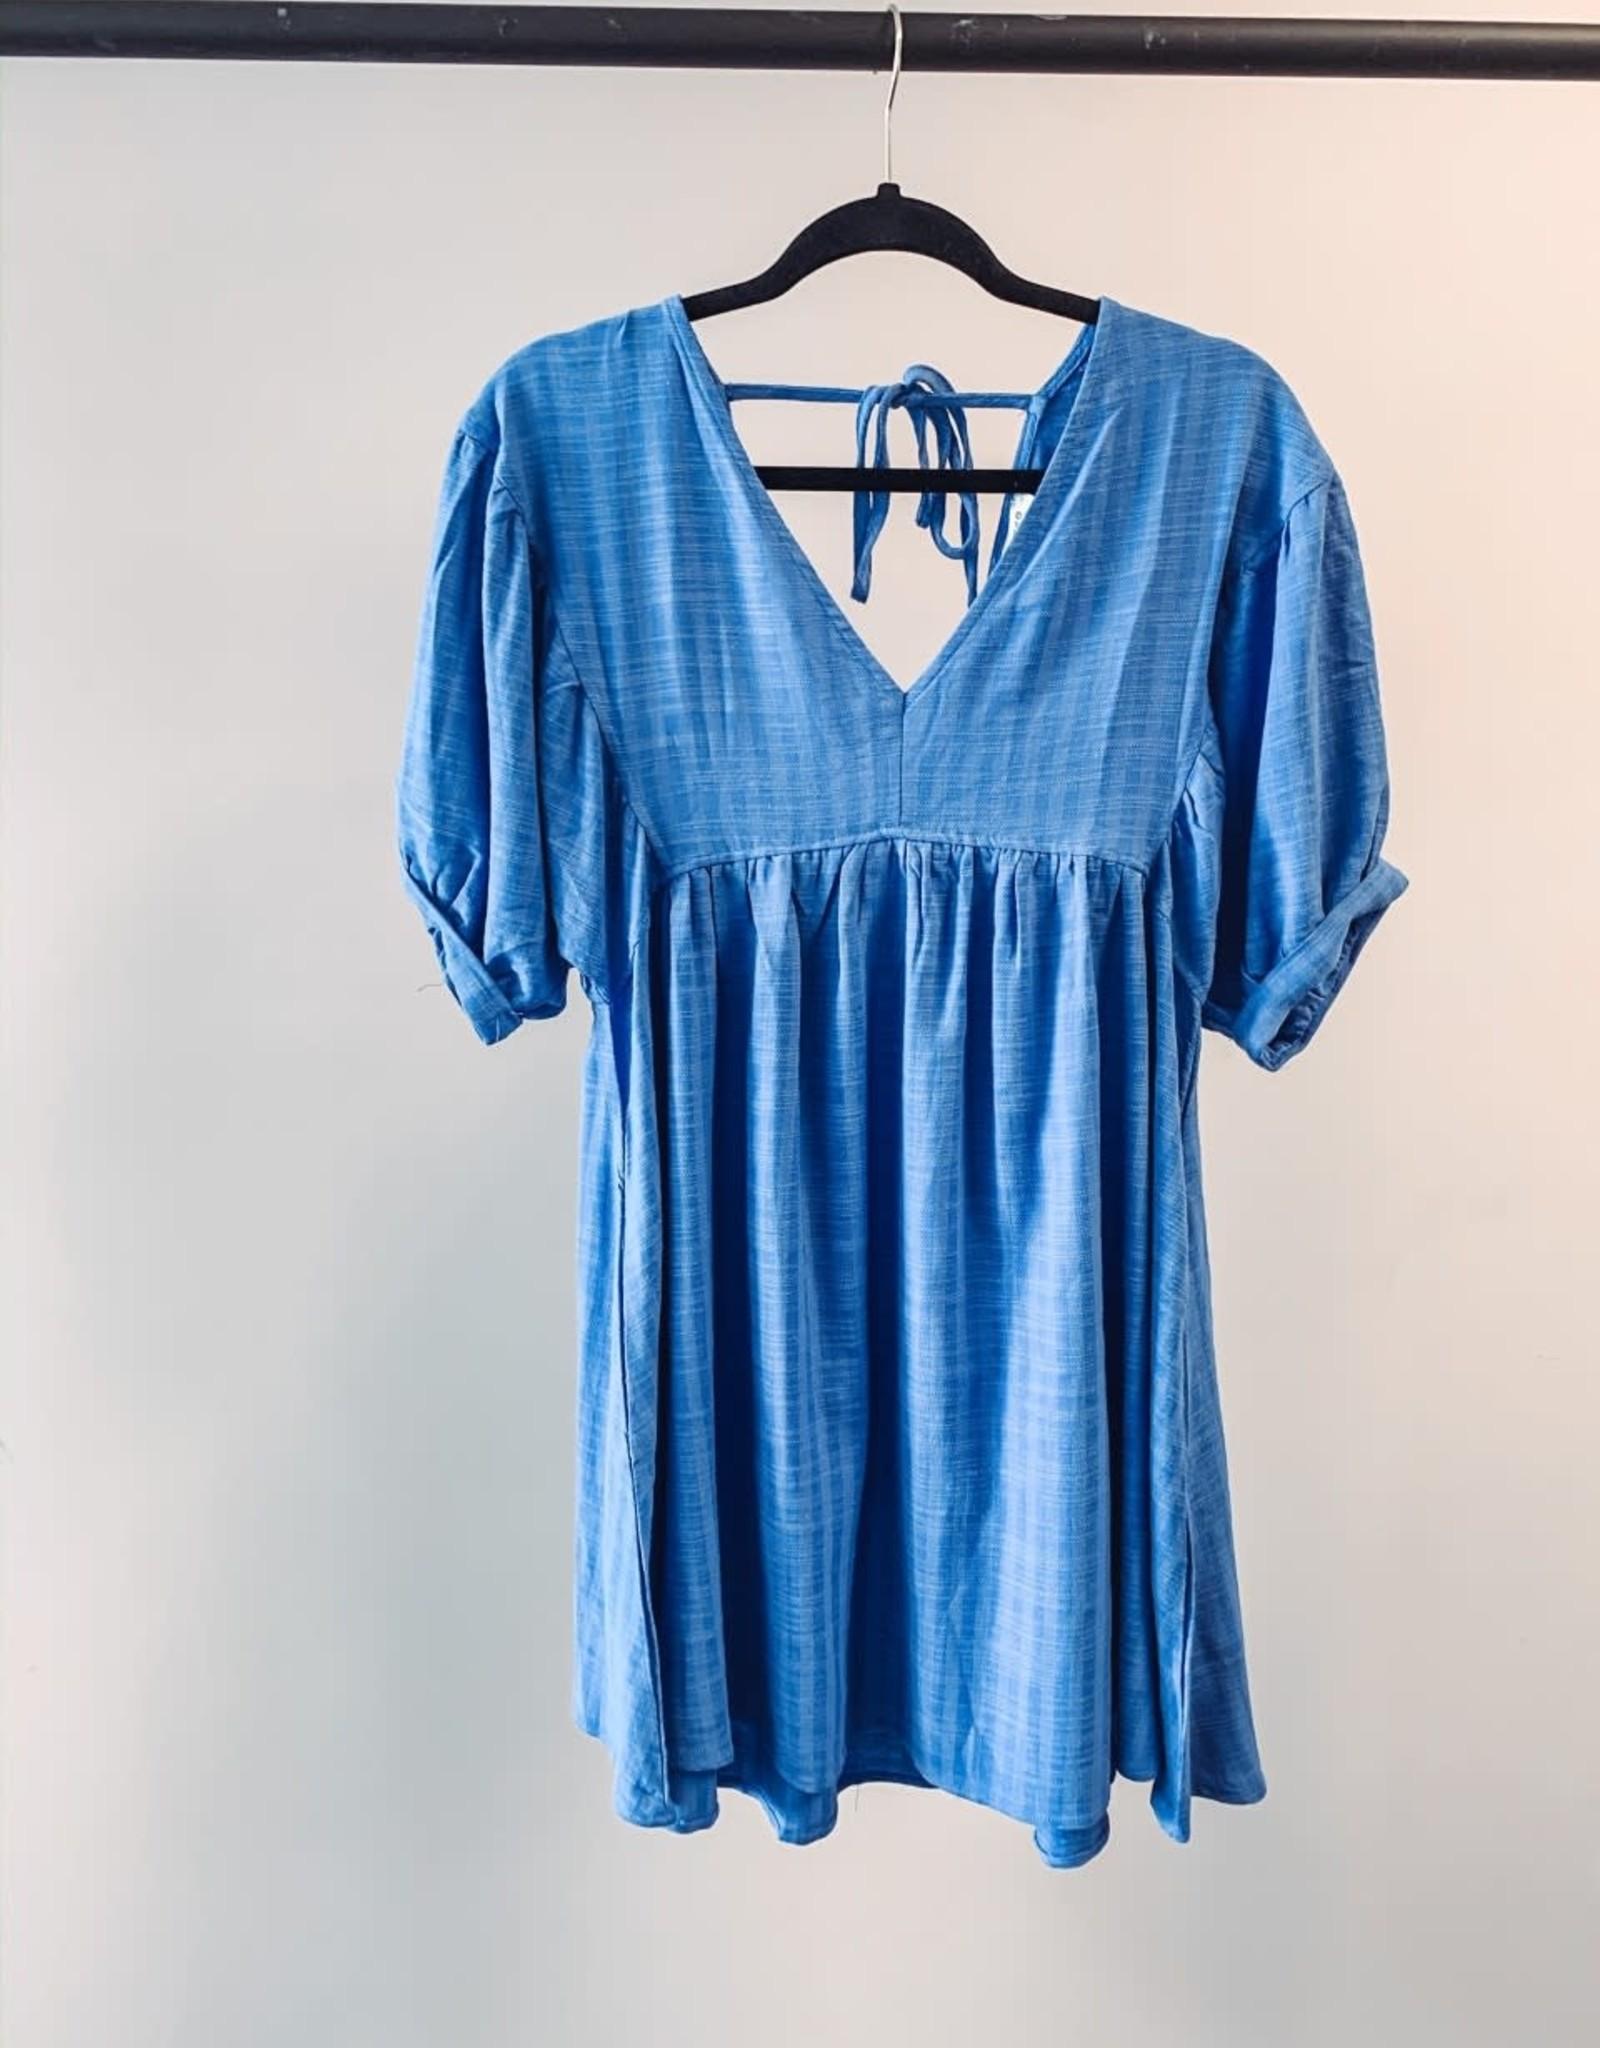 Umgee Puff Sleeve Dress - Blue - Small